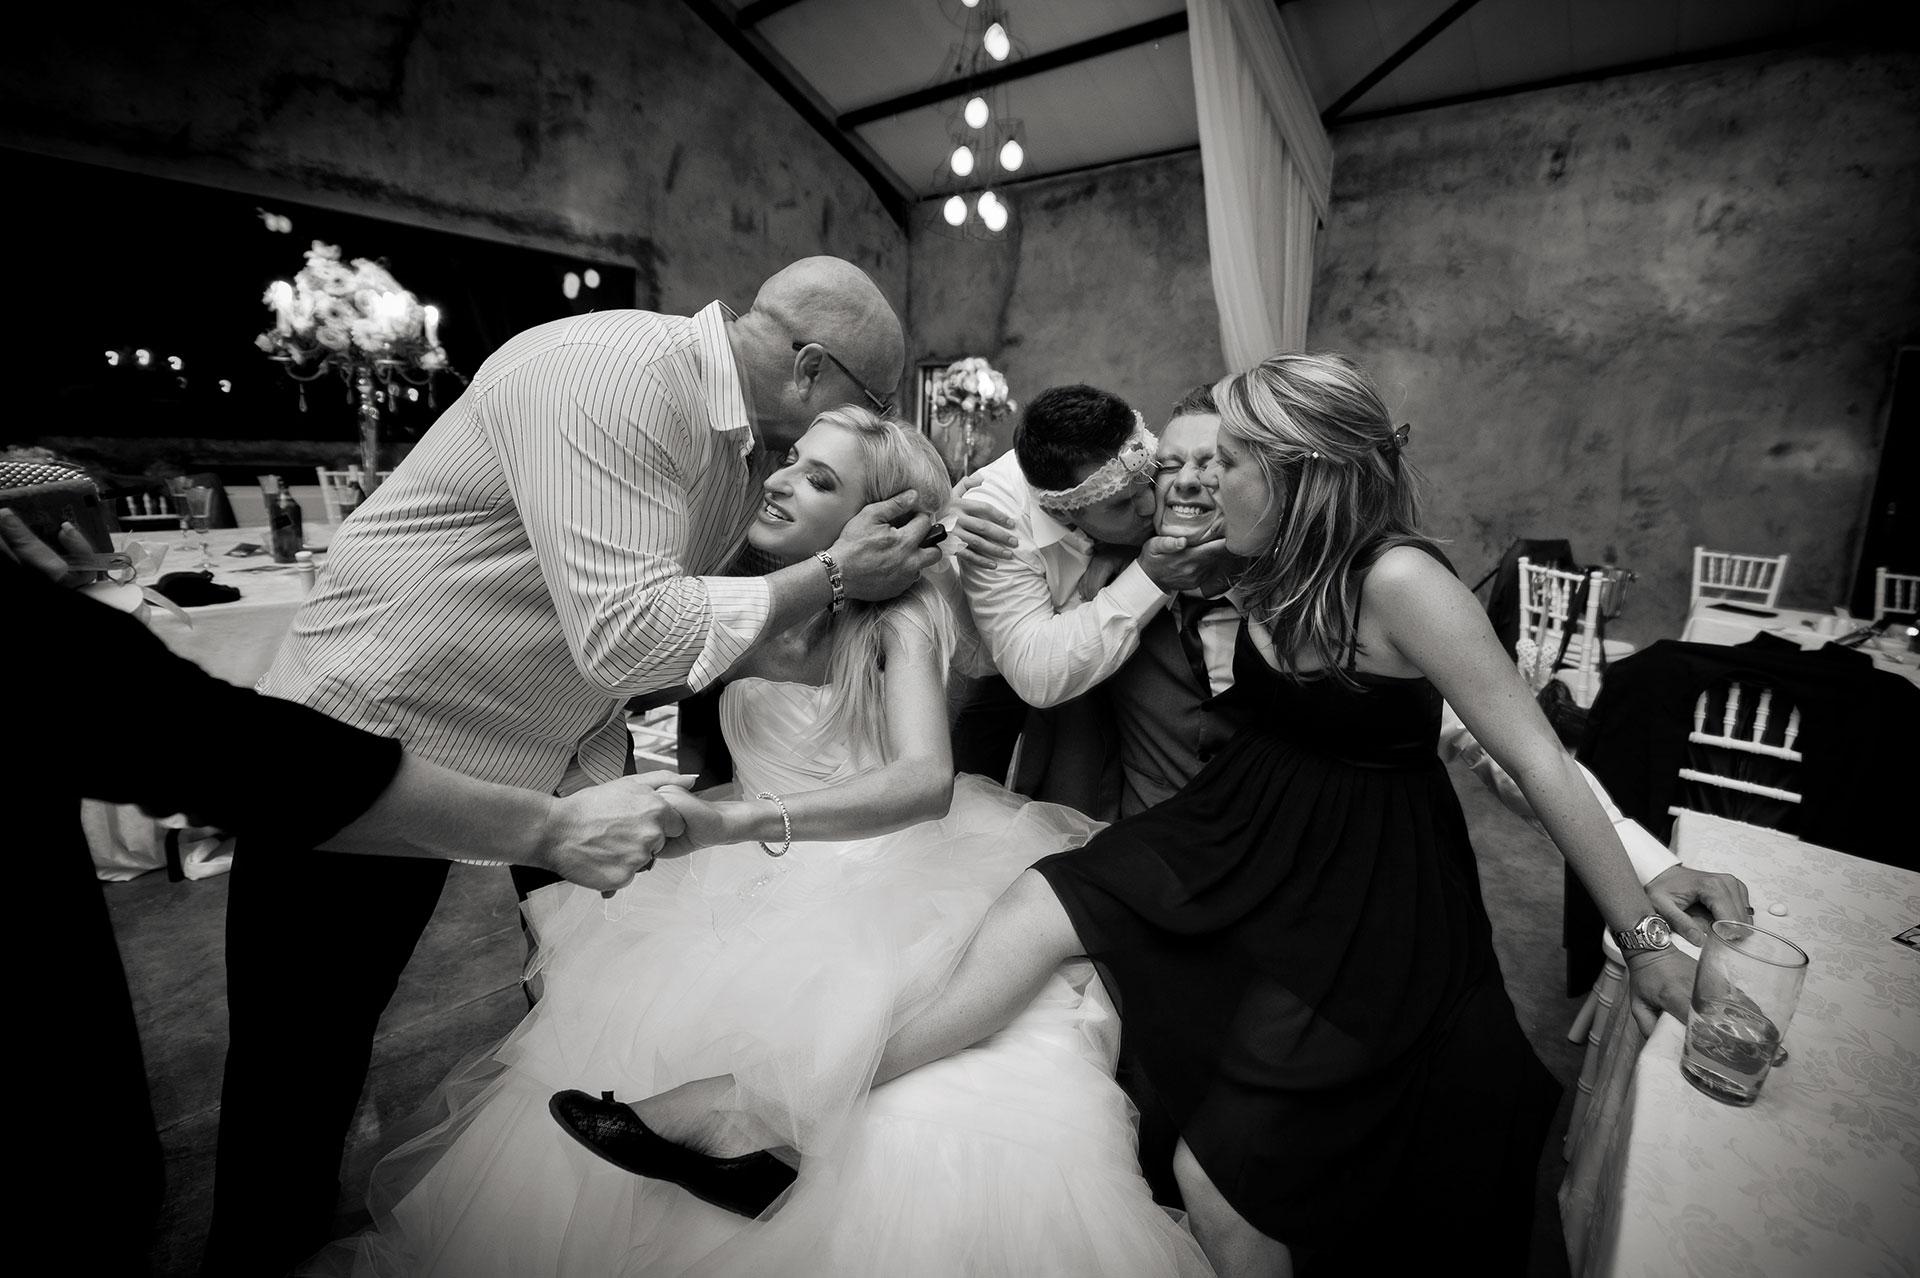 Testimonials-Top-South-African-Wedding-Photographer-Jacki-Bruniquel-005-077